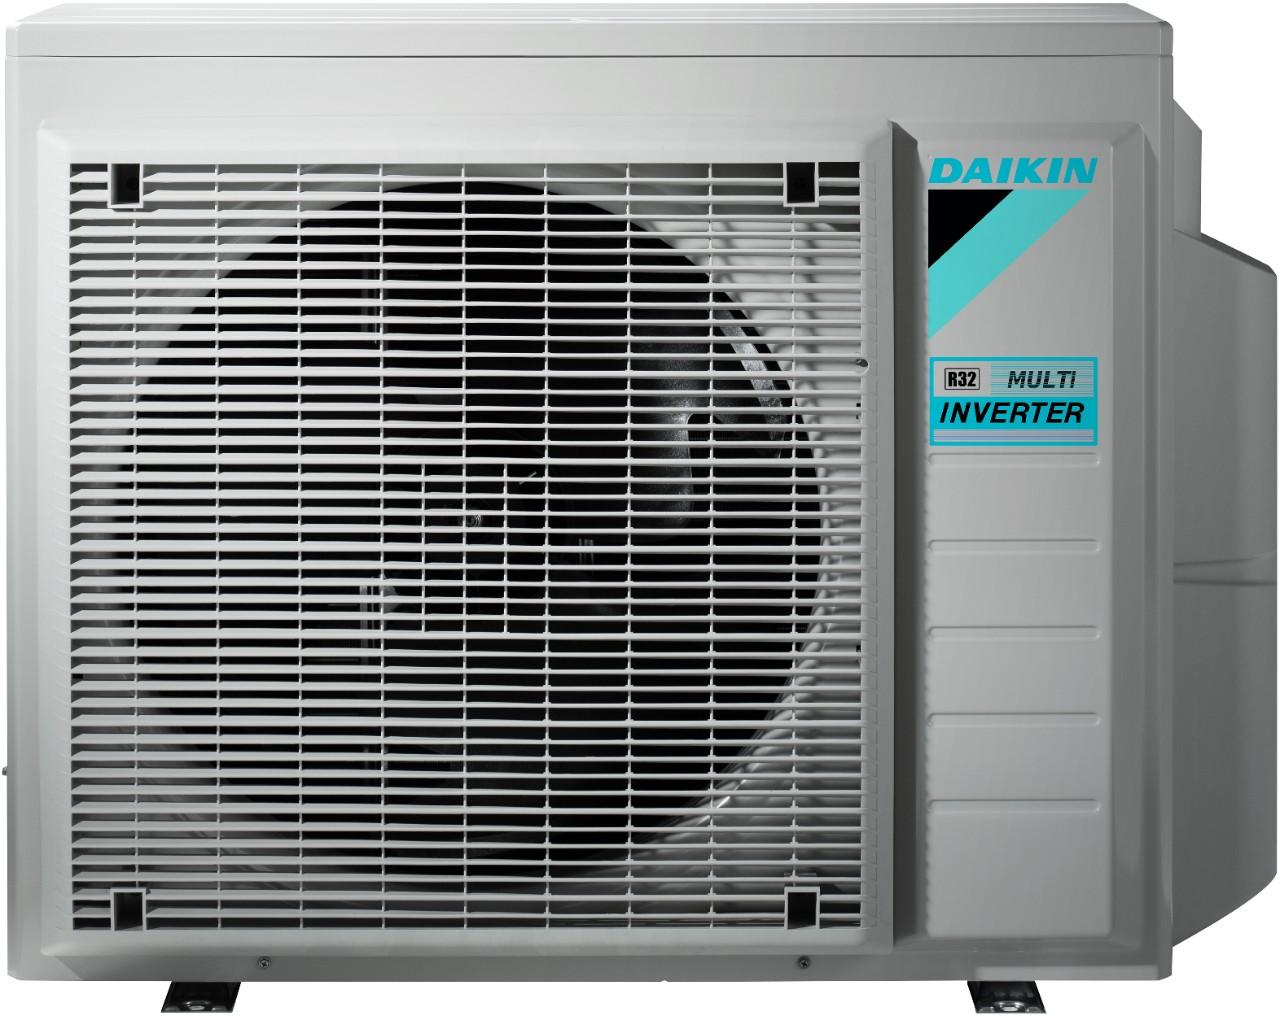 Climatiseur trisplit réversible inverter DAIKIN 3MXM68N9.